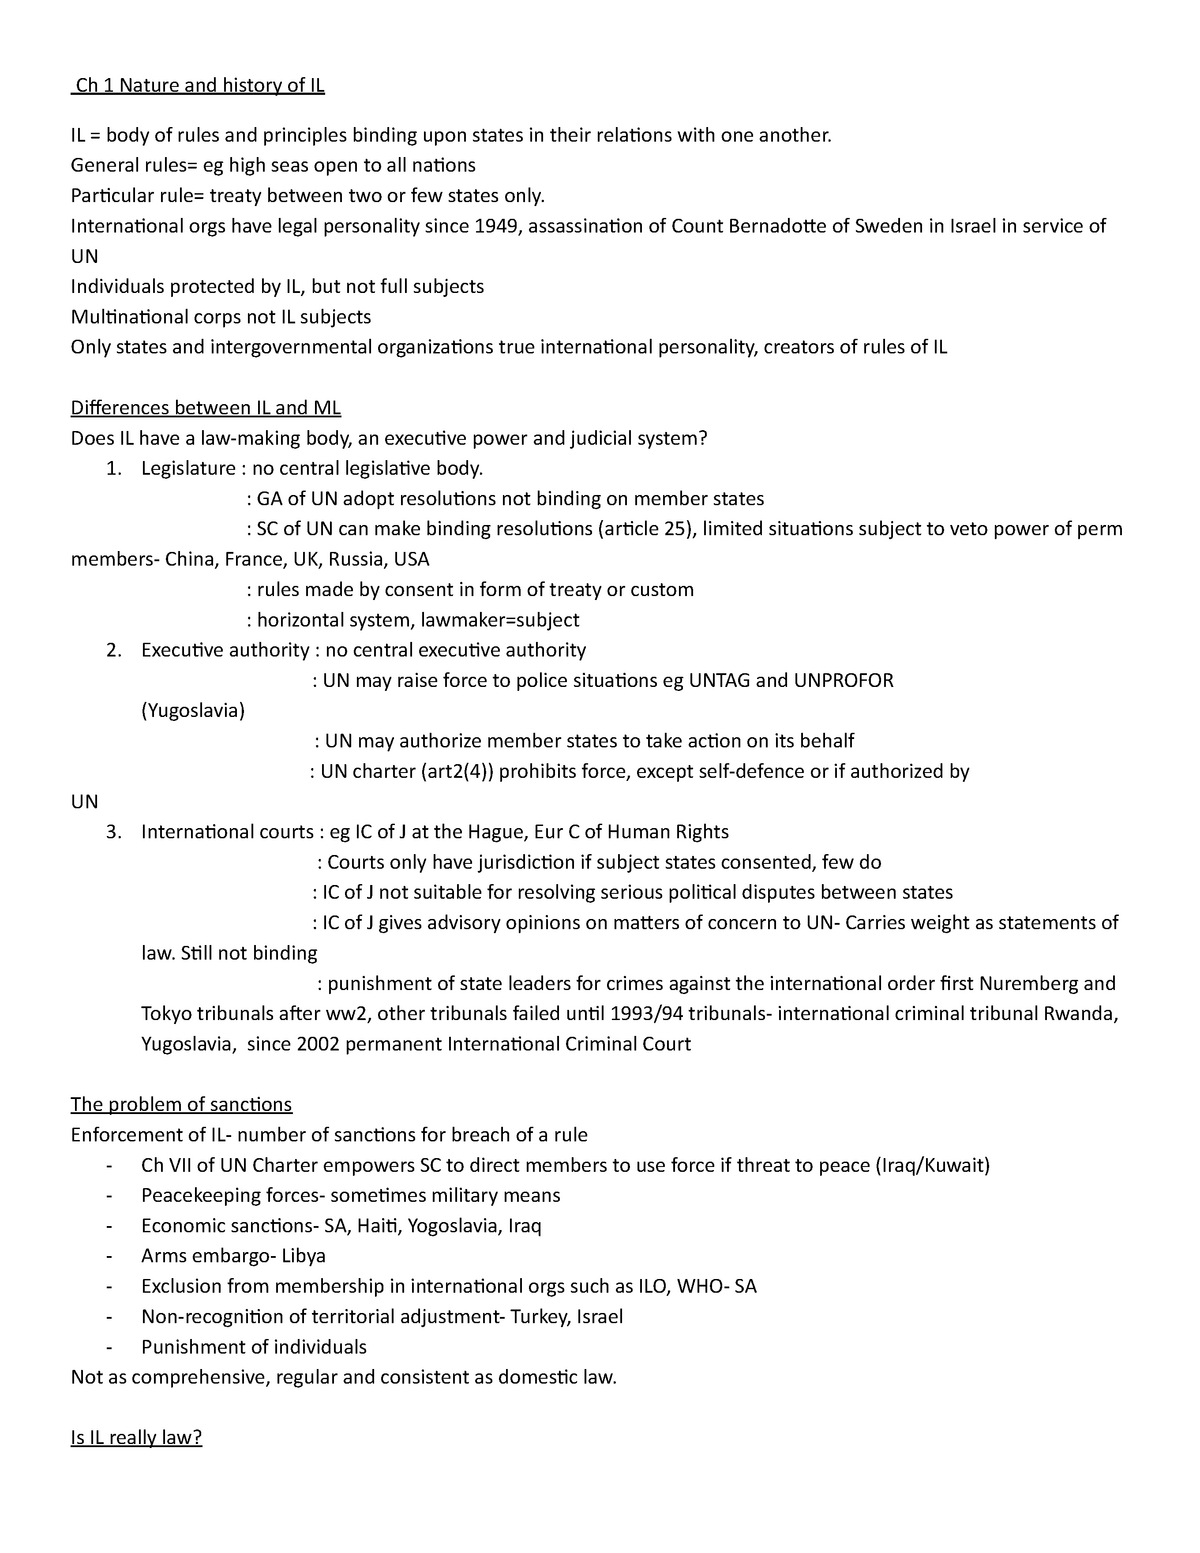 LCP4801-summaries - Public International law LAWS302 - StuDocu